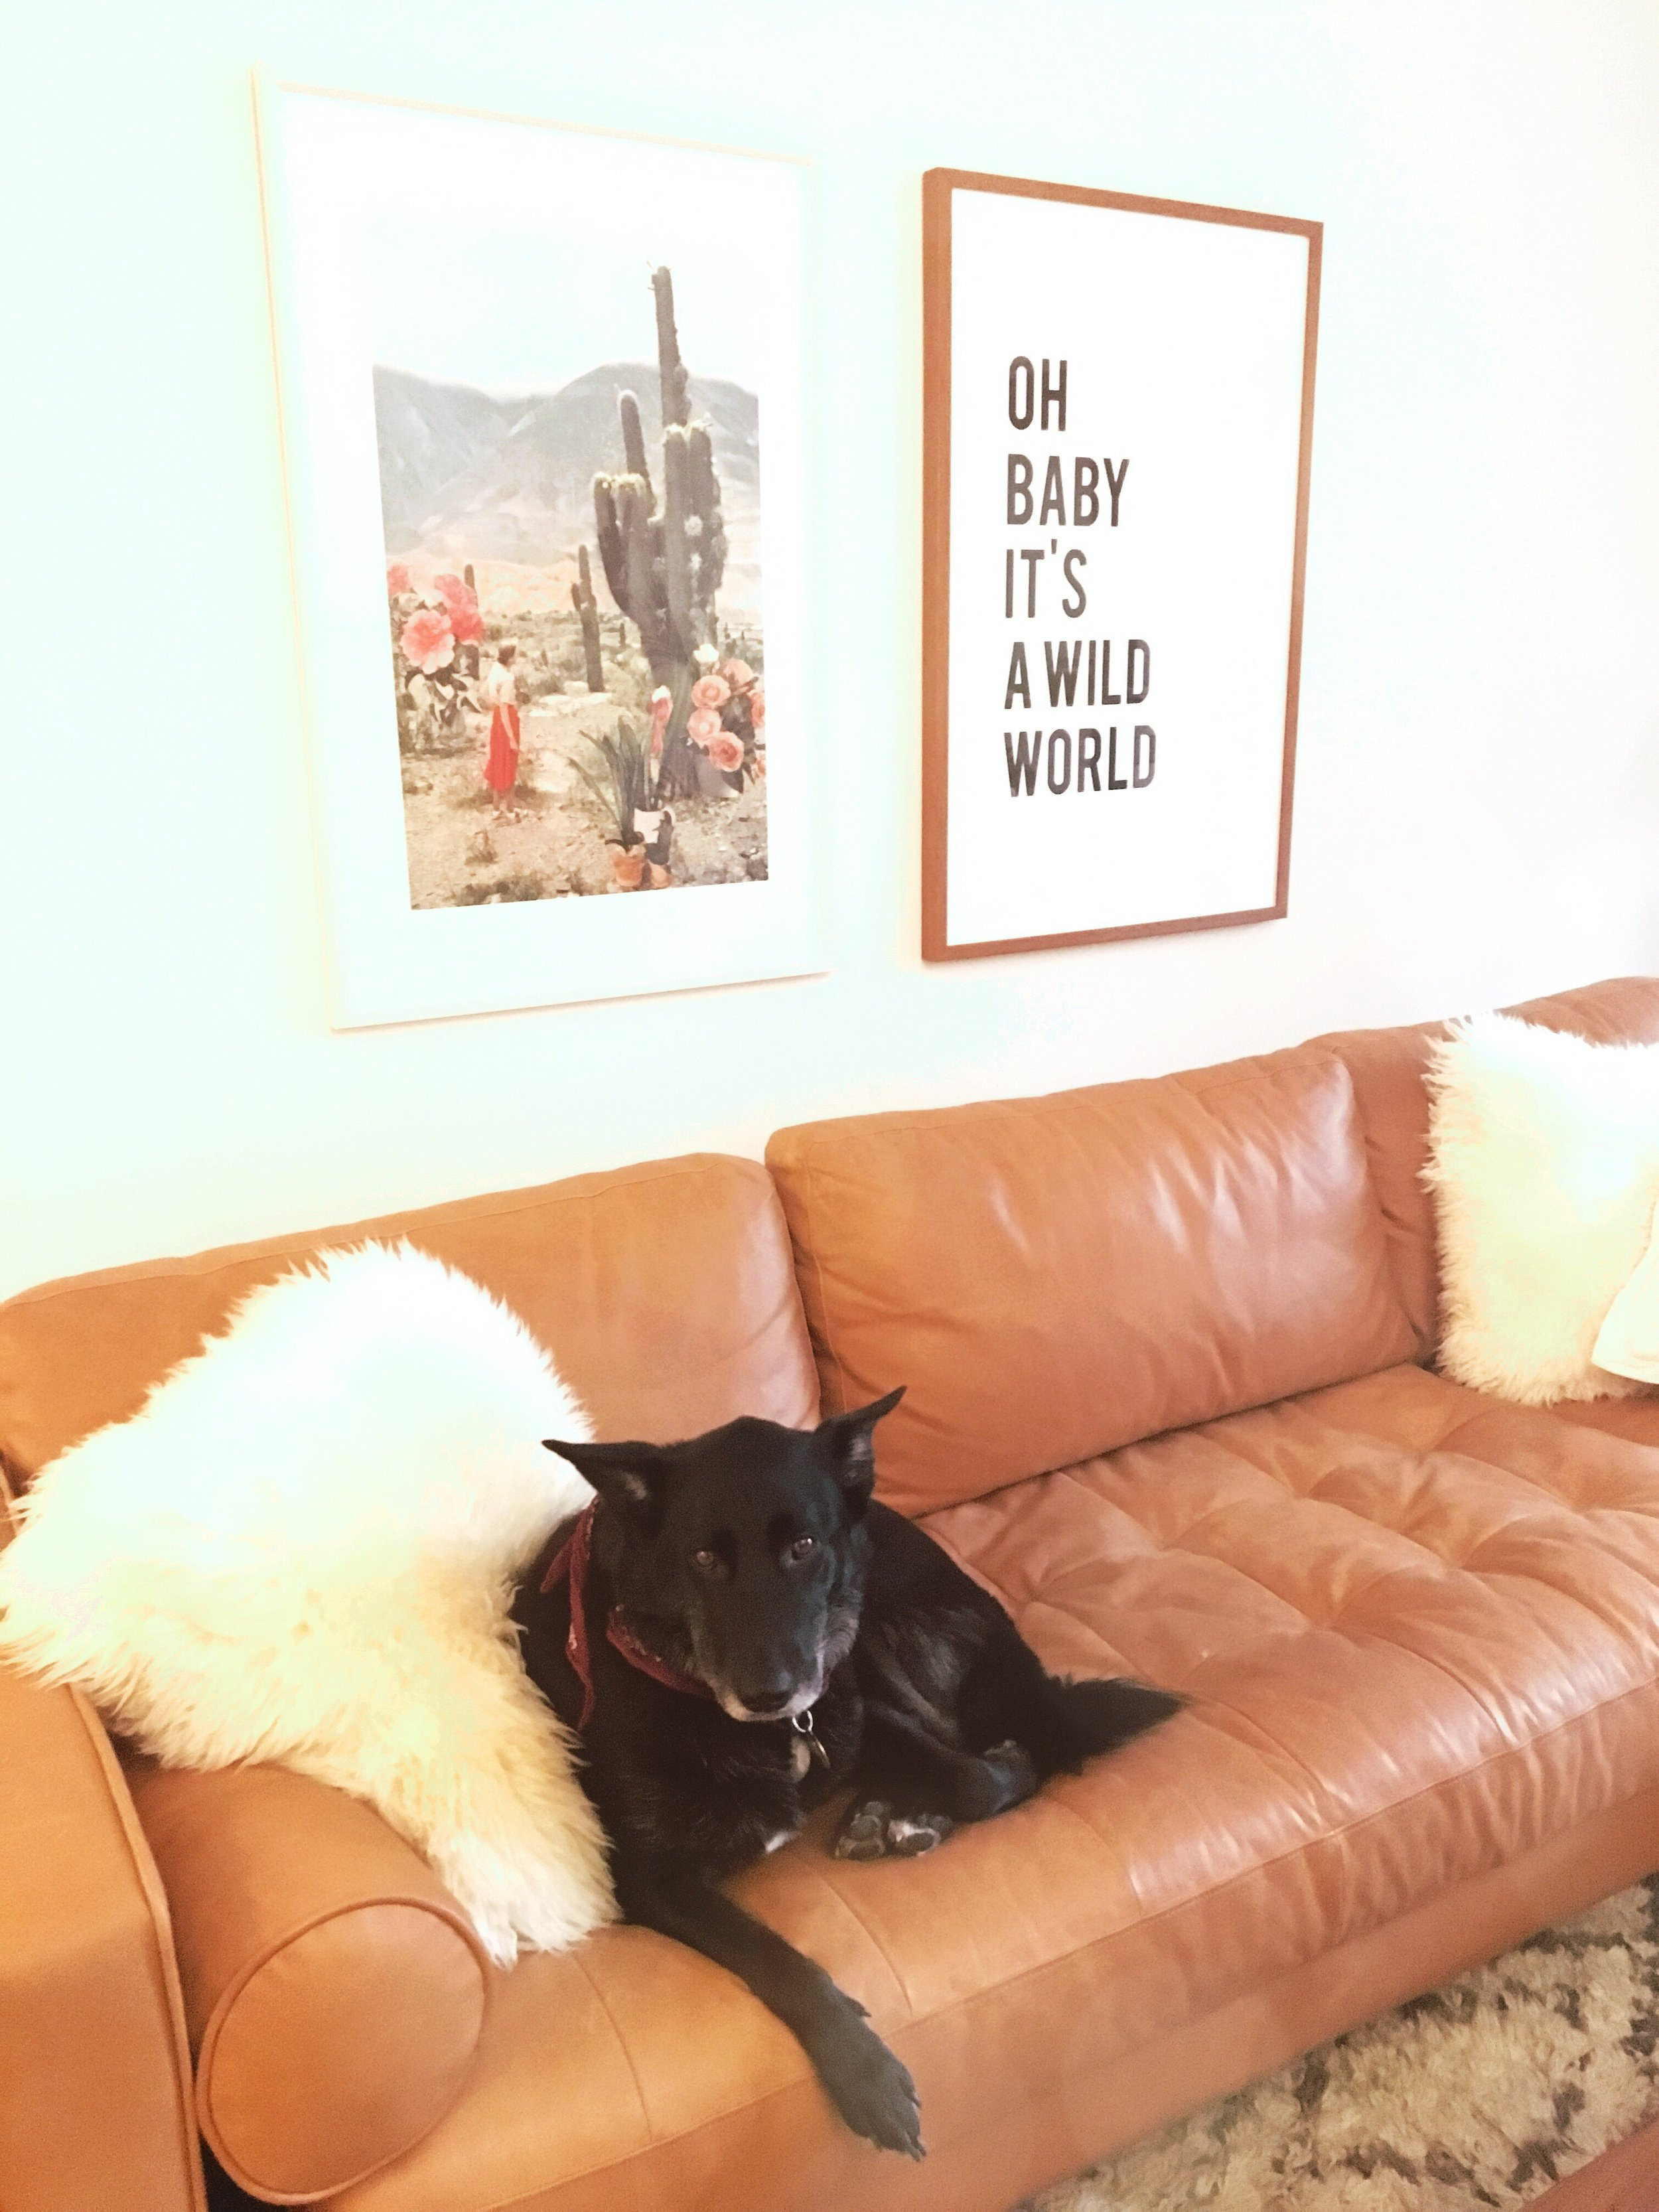 THE FUNKY FRESH / BOHO DREAMS LIVING ROOM